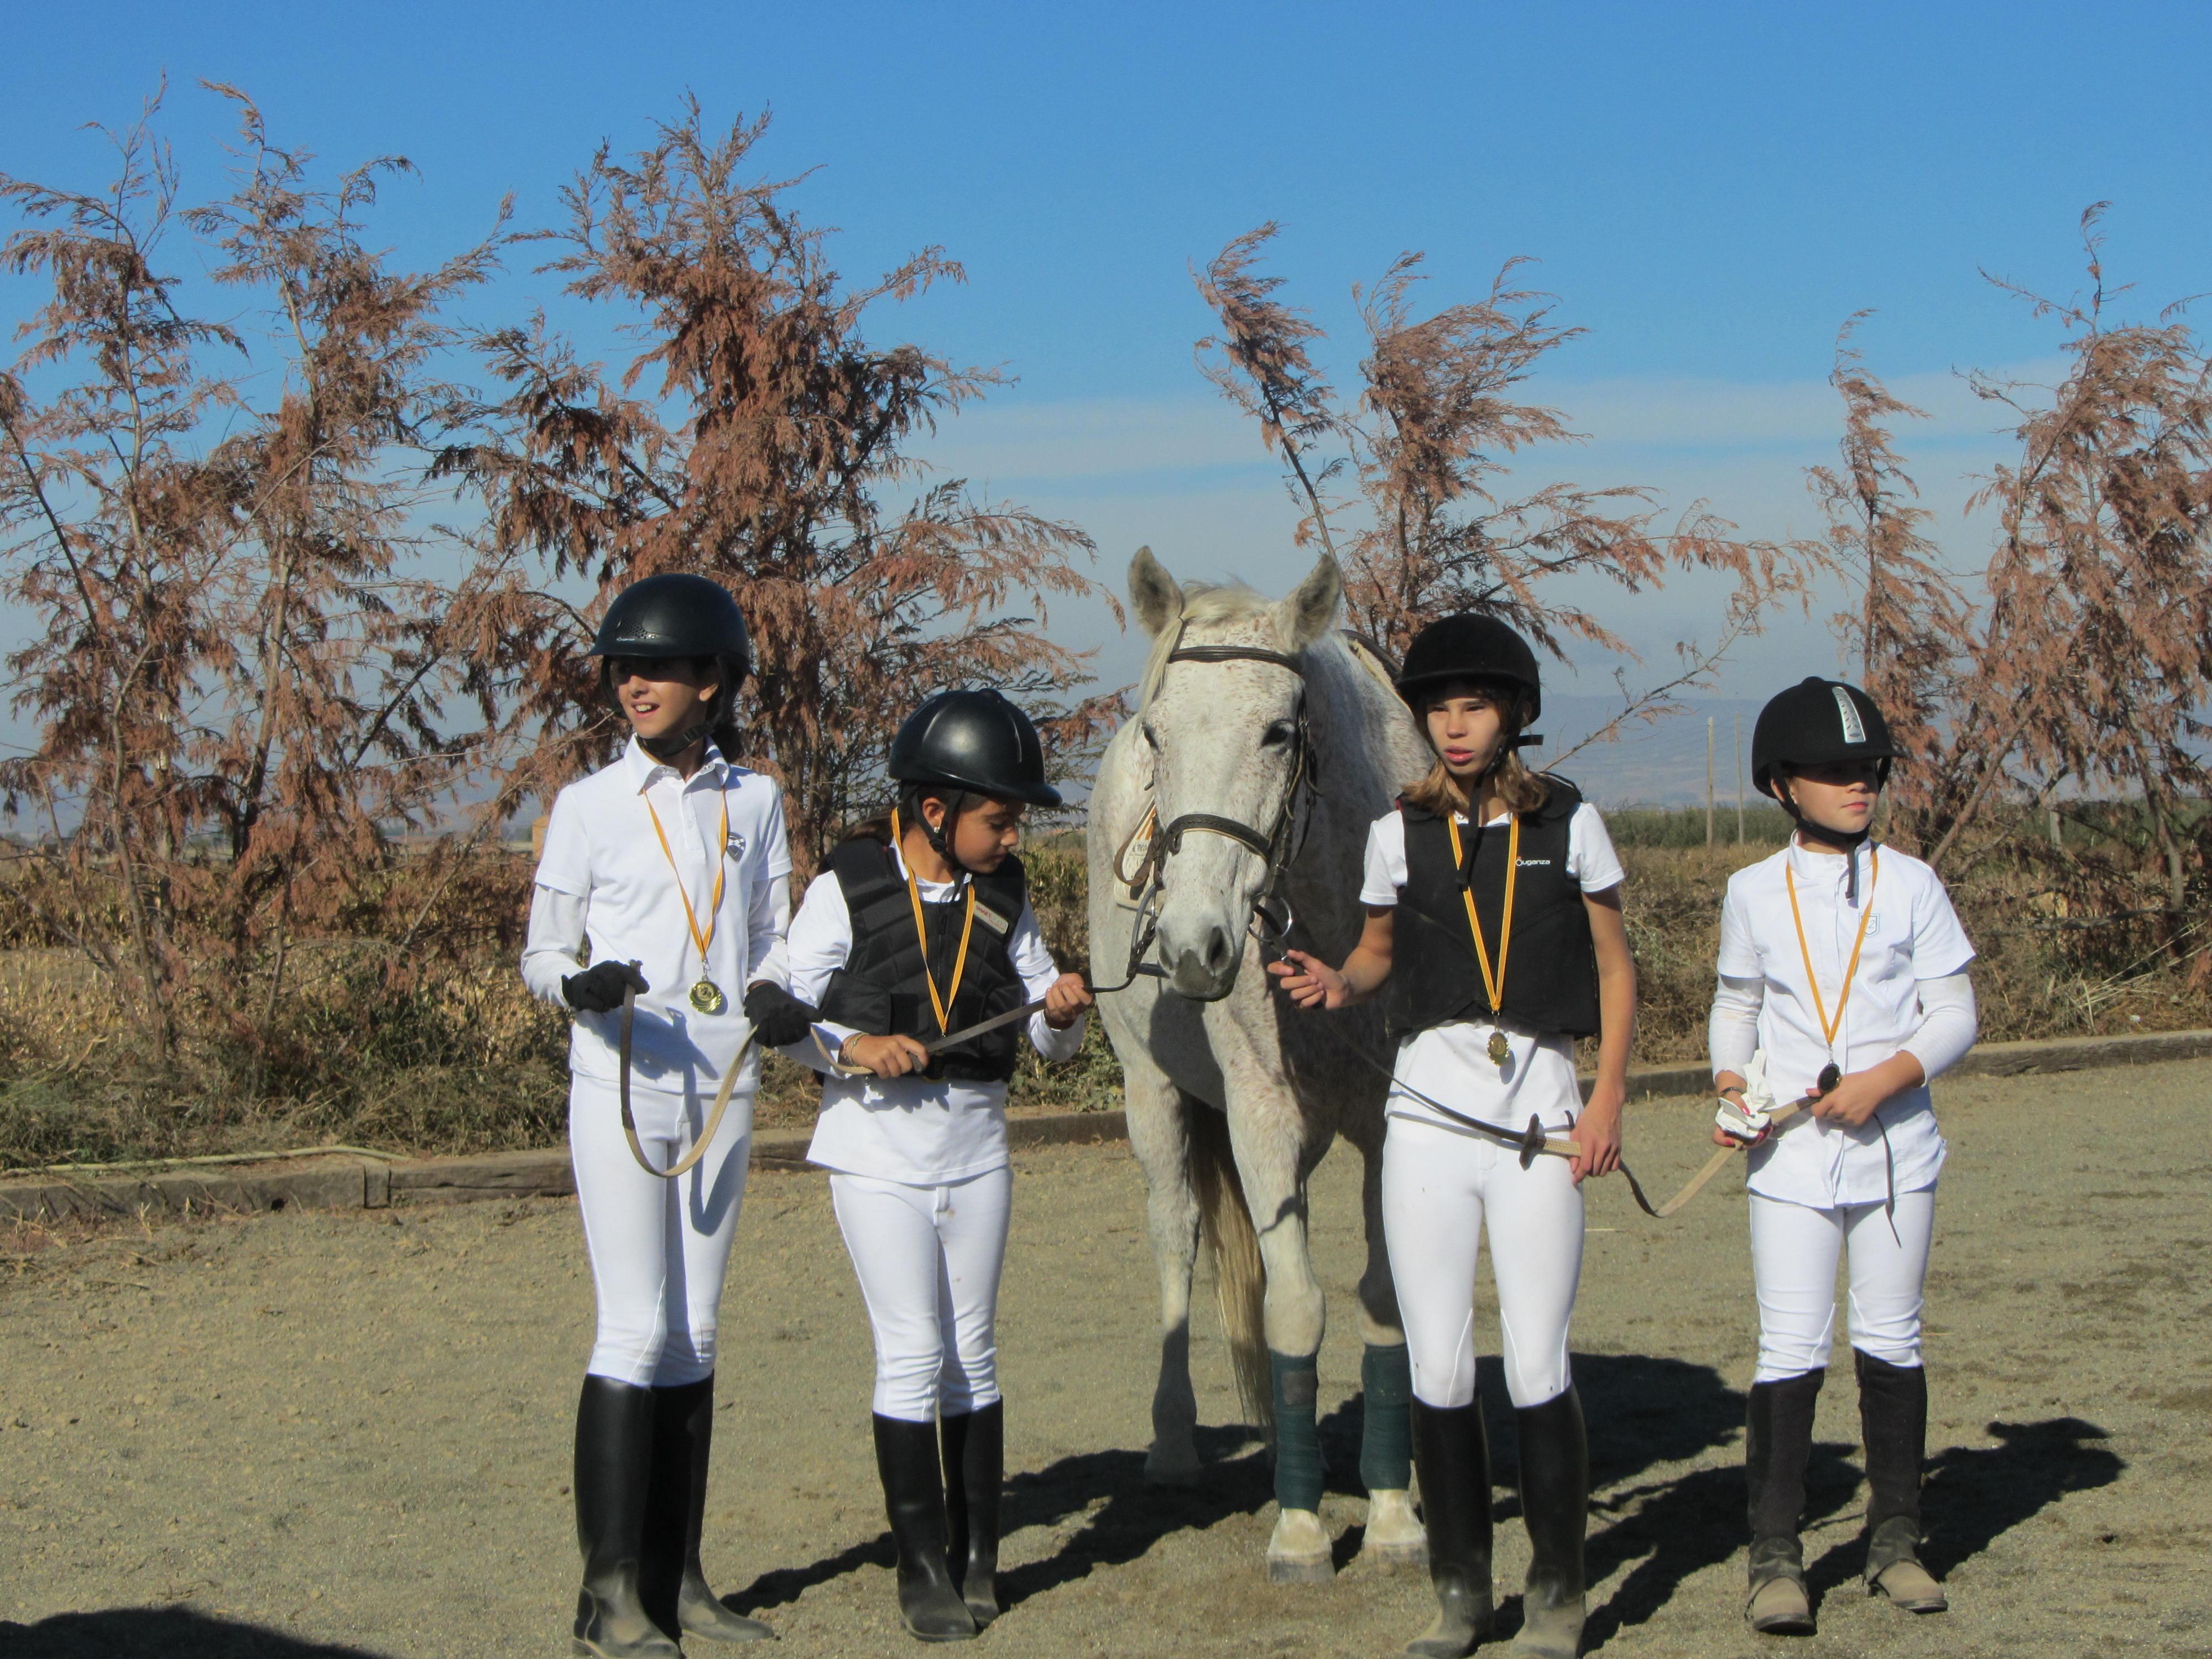 sals cavalls 3-11-13